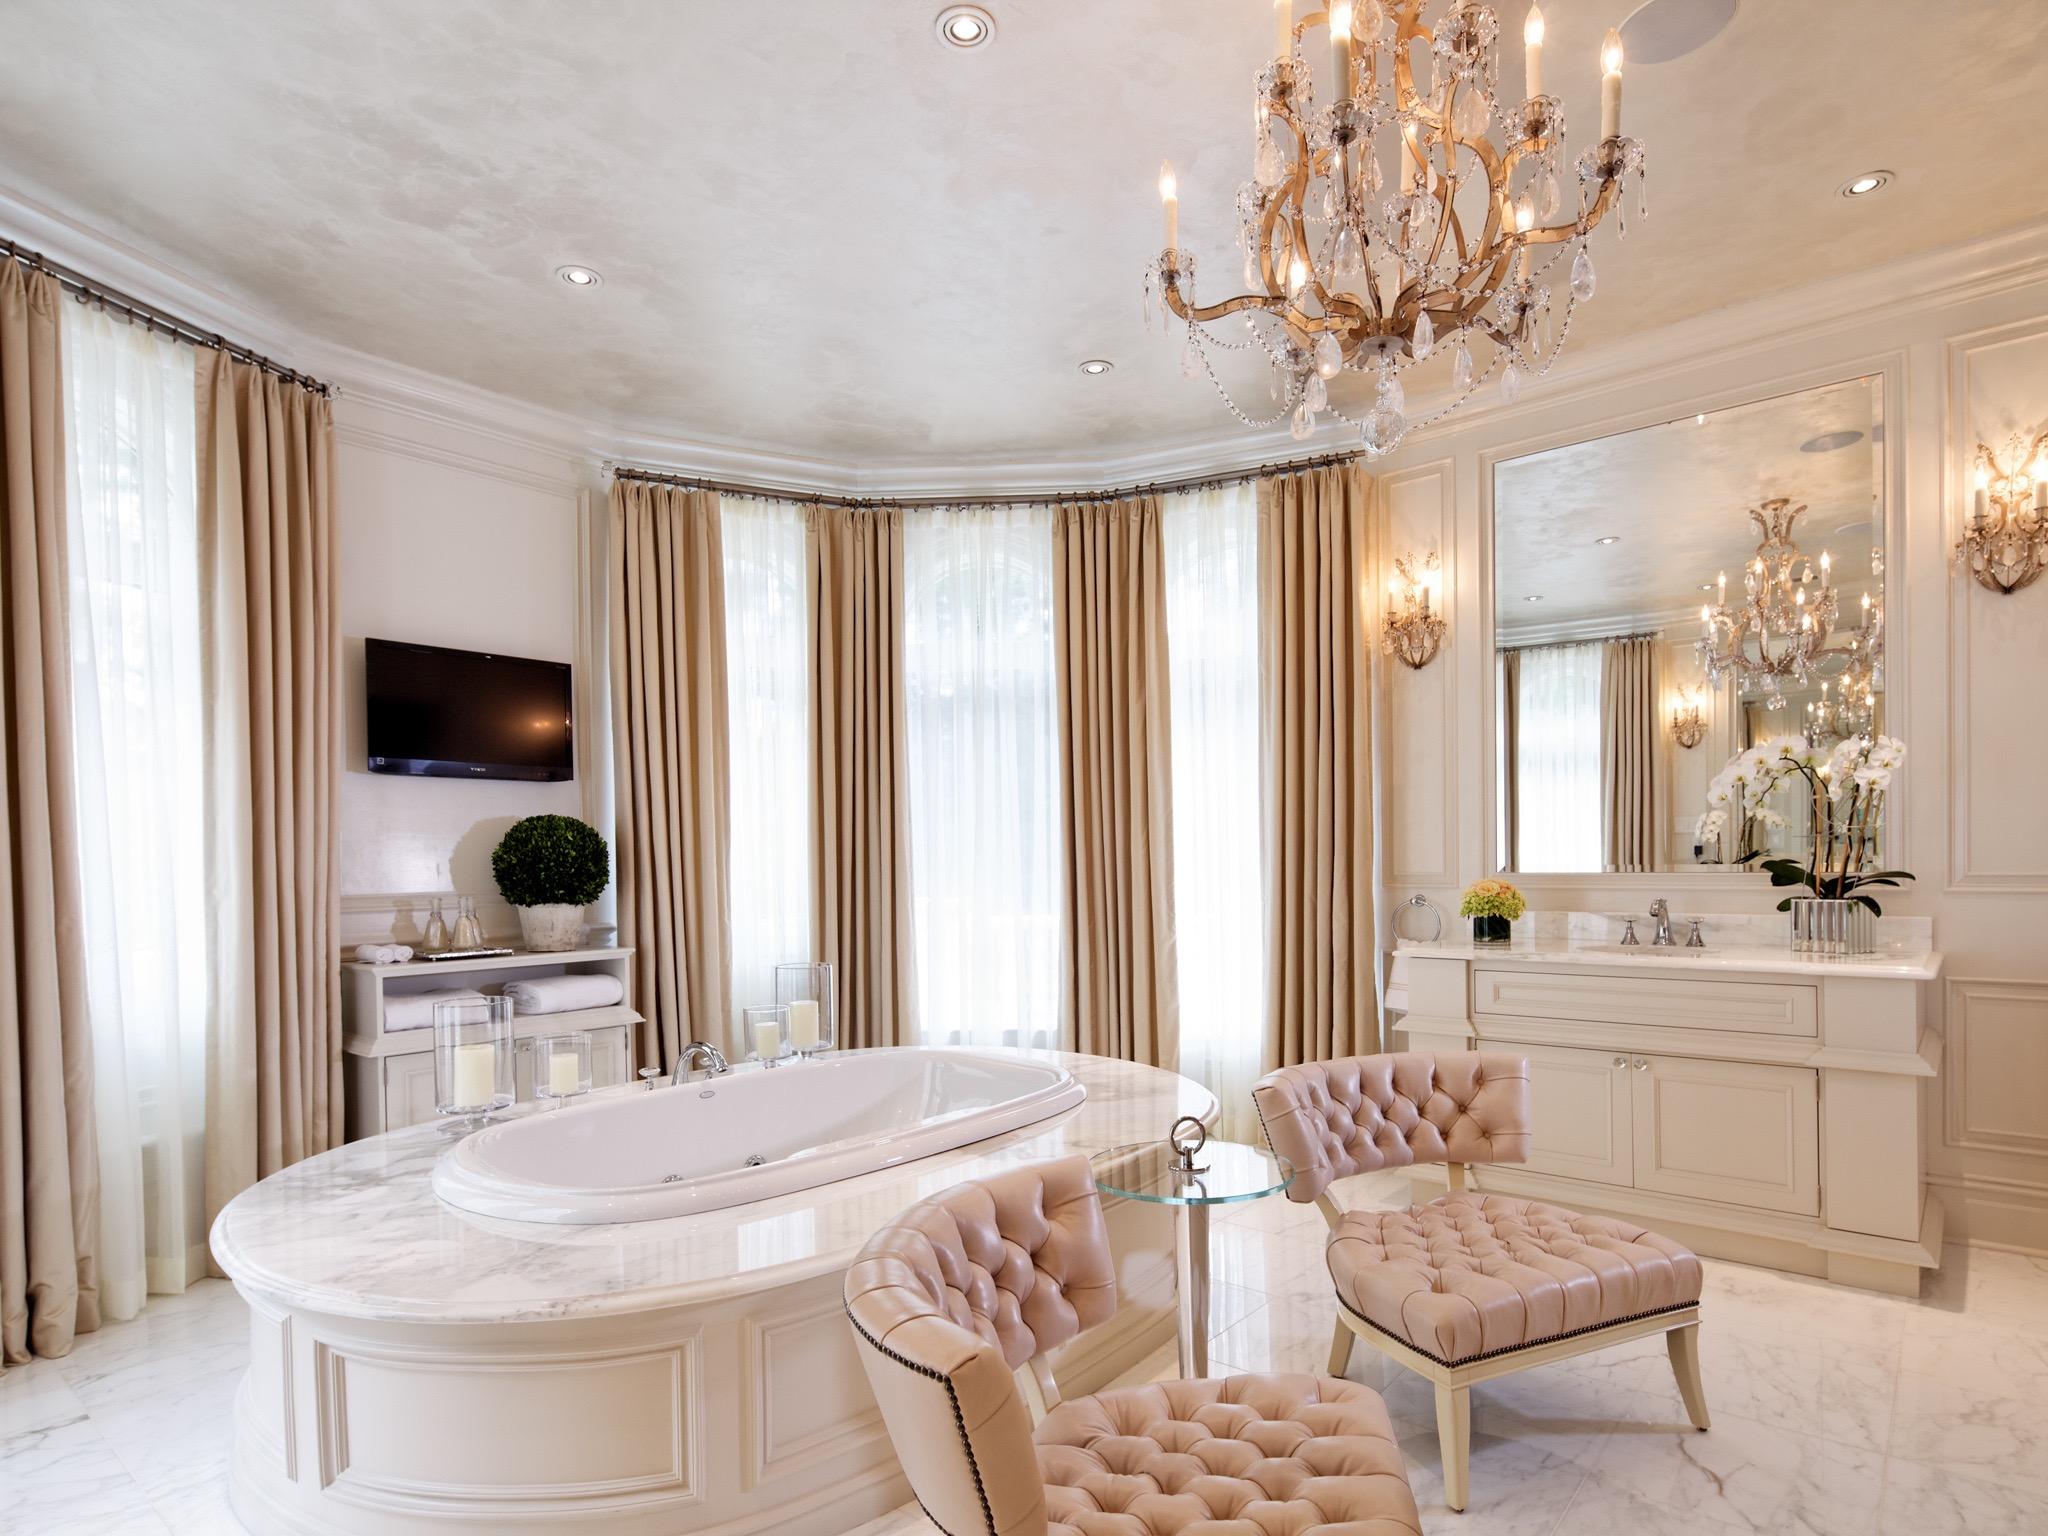 Luxury Elegant Master Bathroom With Marble Floors (View 8 of 8)